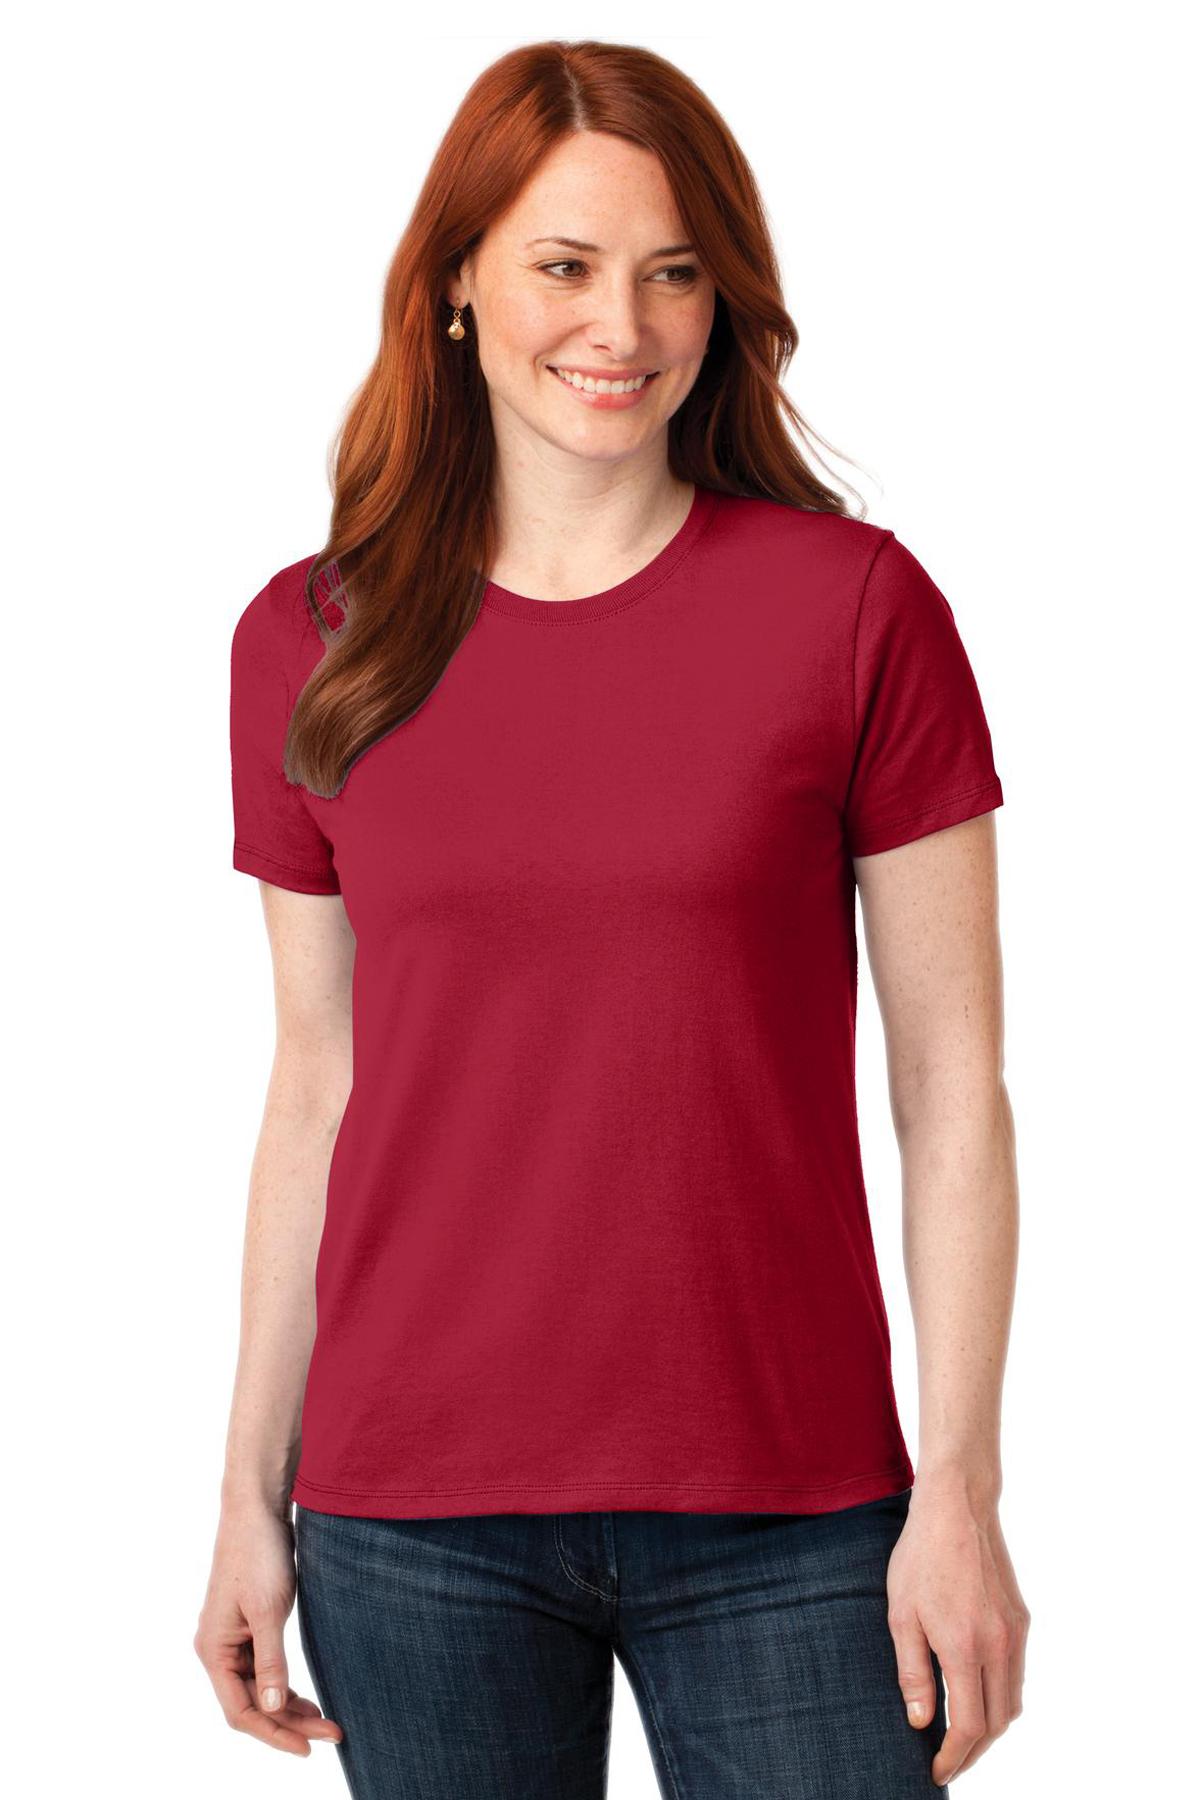 T-Shirts-Ladies-14